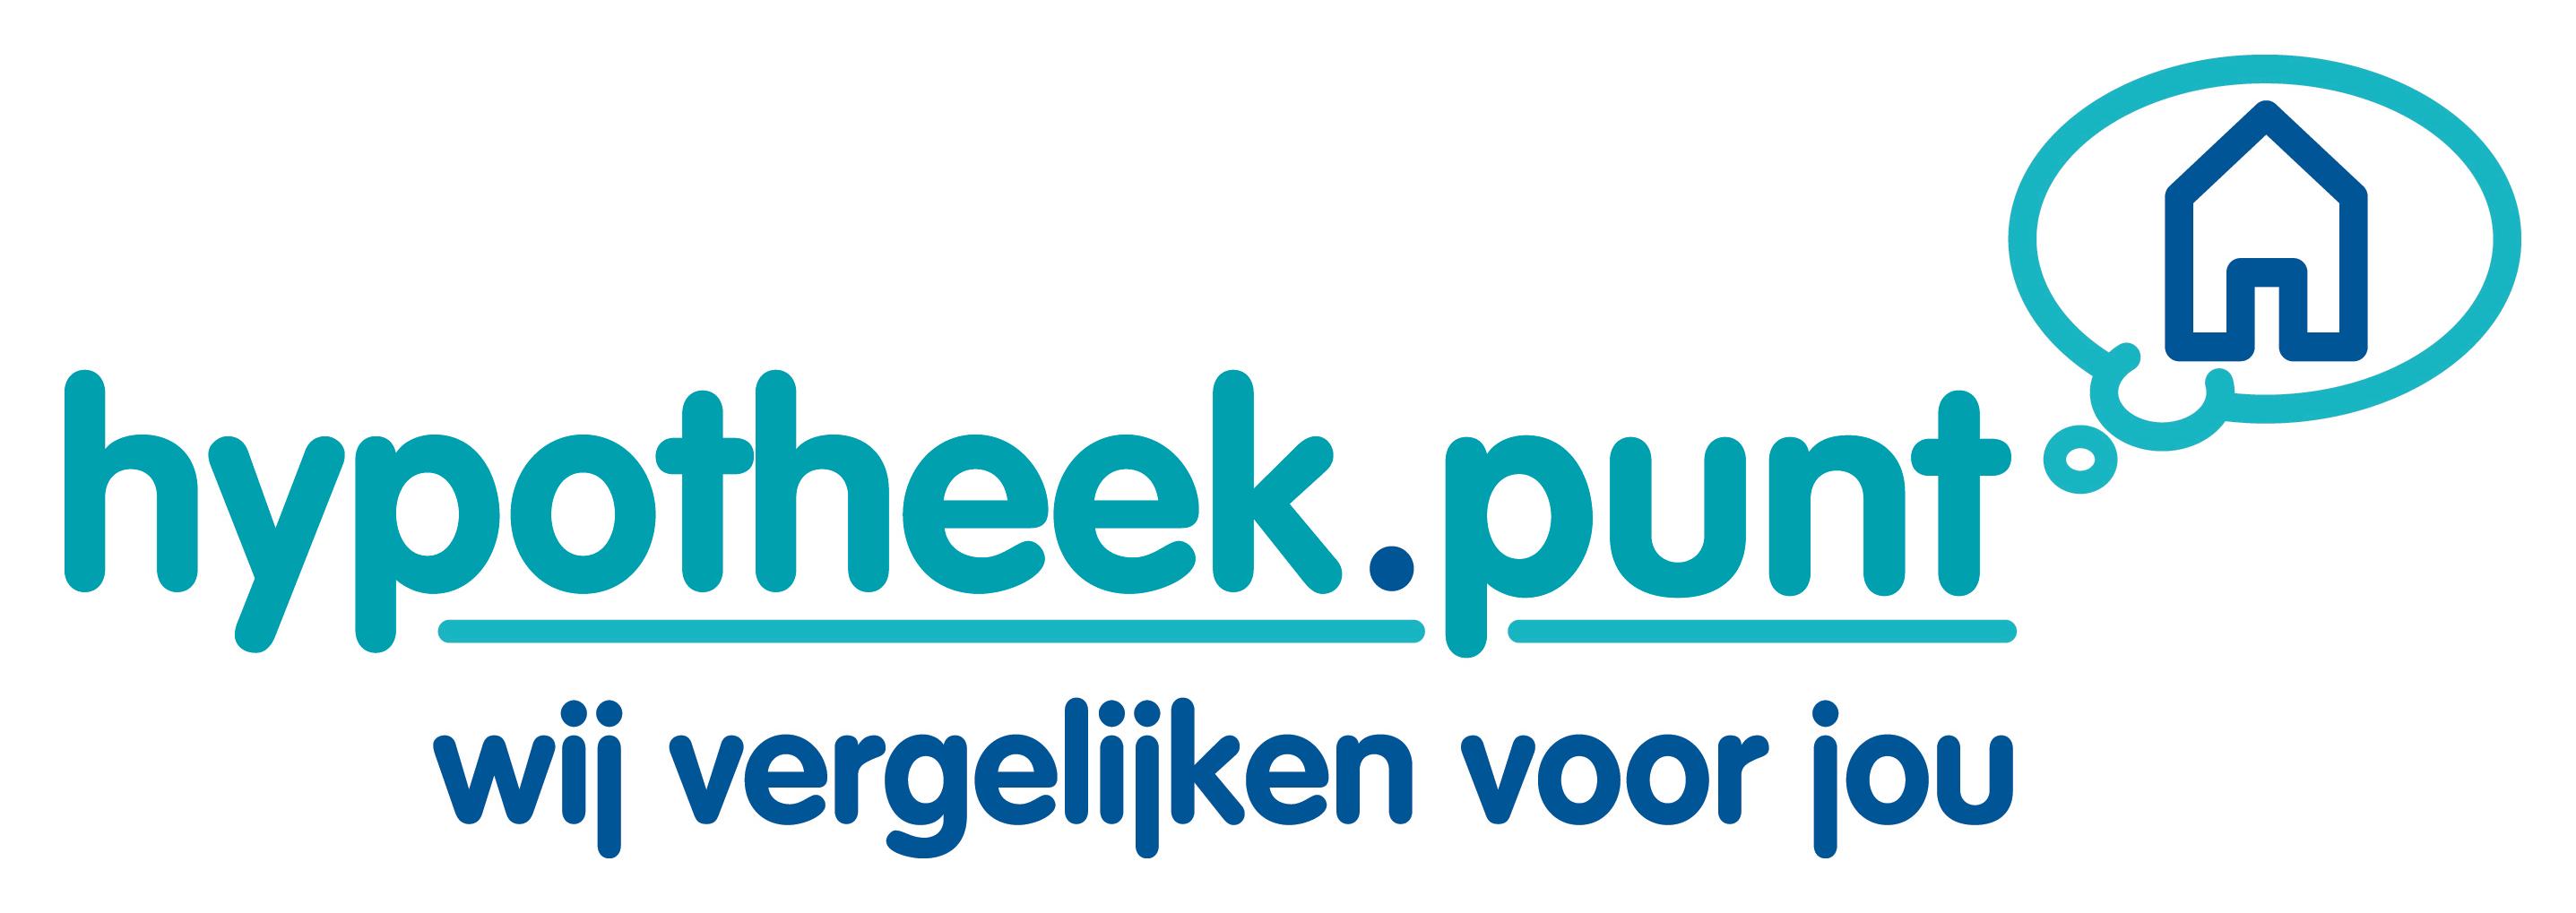 Logo hypotheek.punt